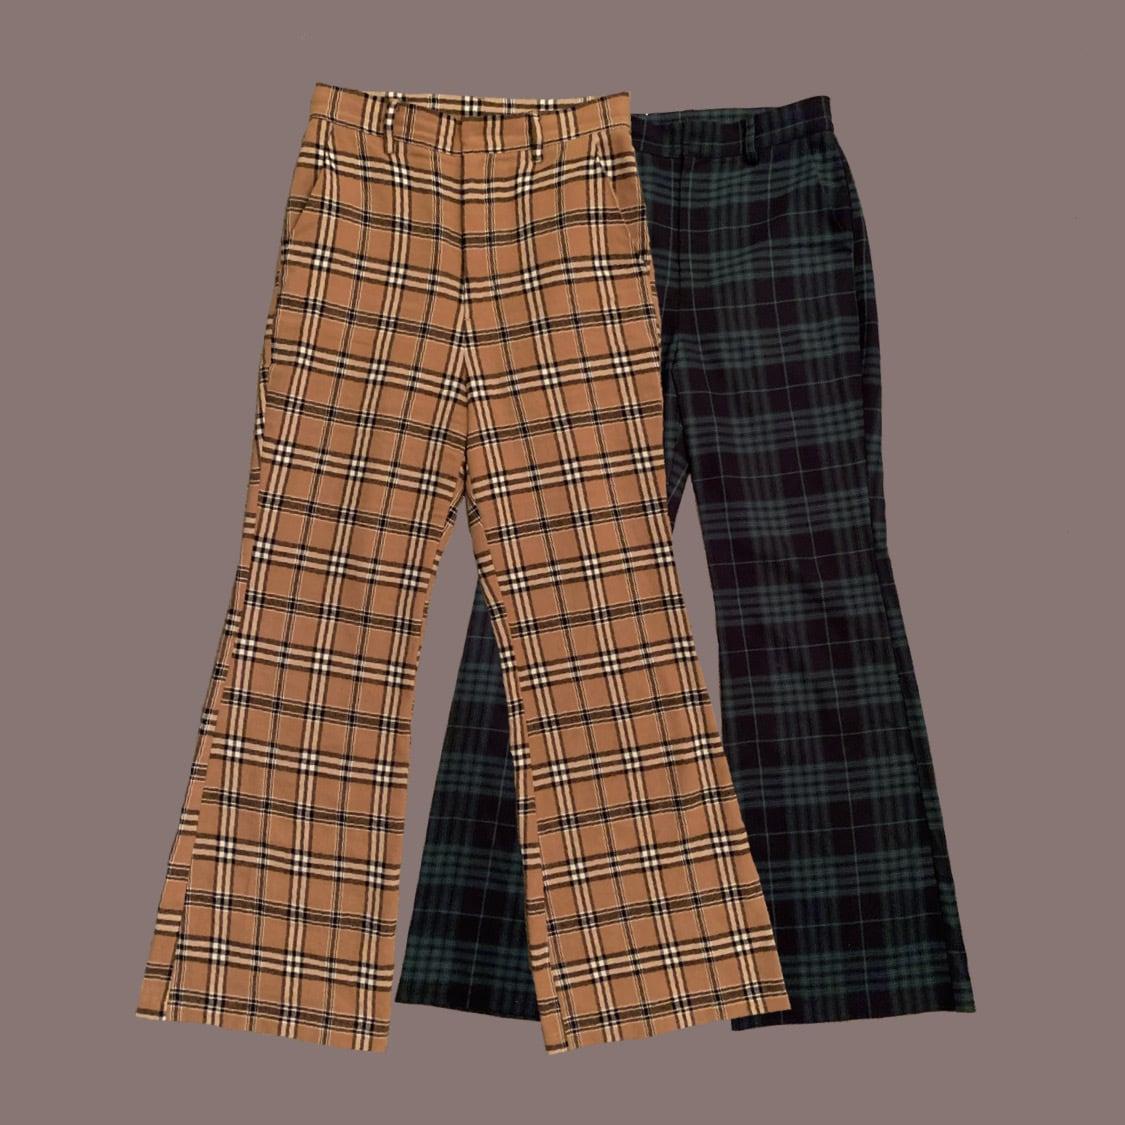 Désir original London check pants